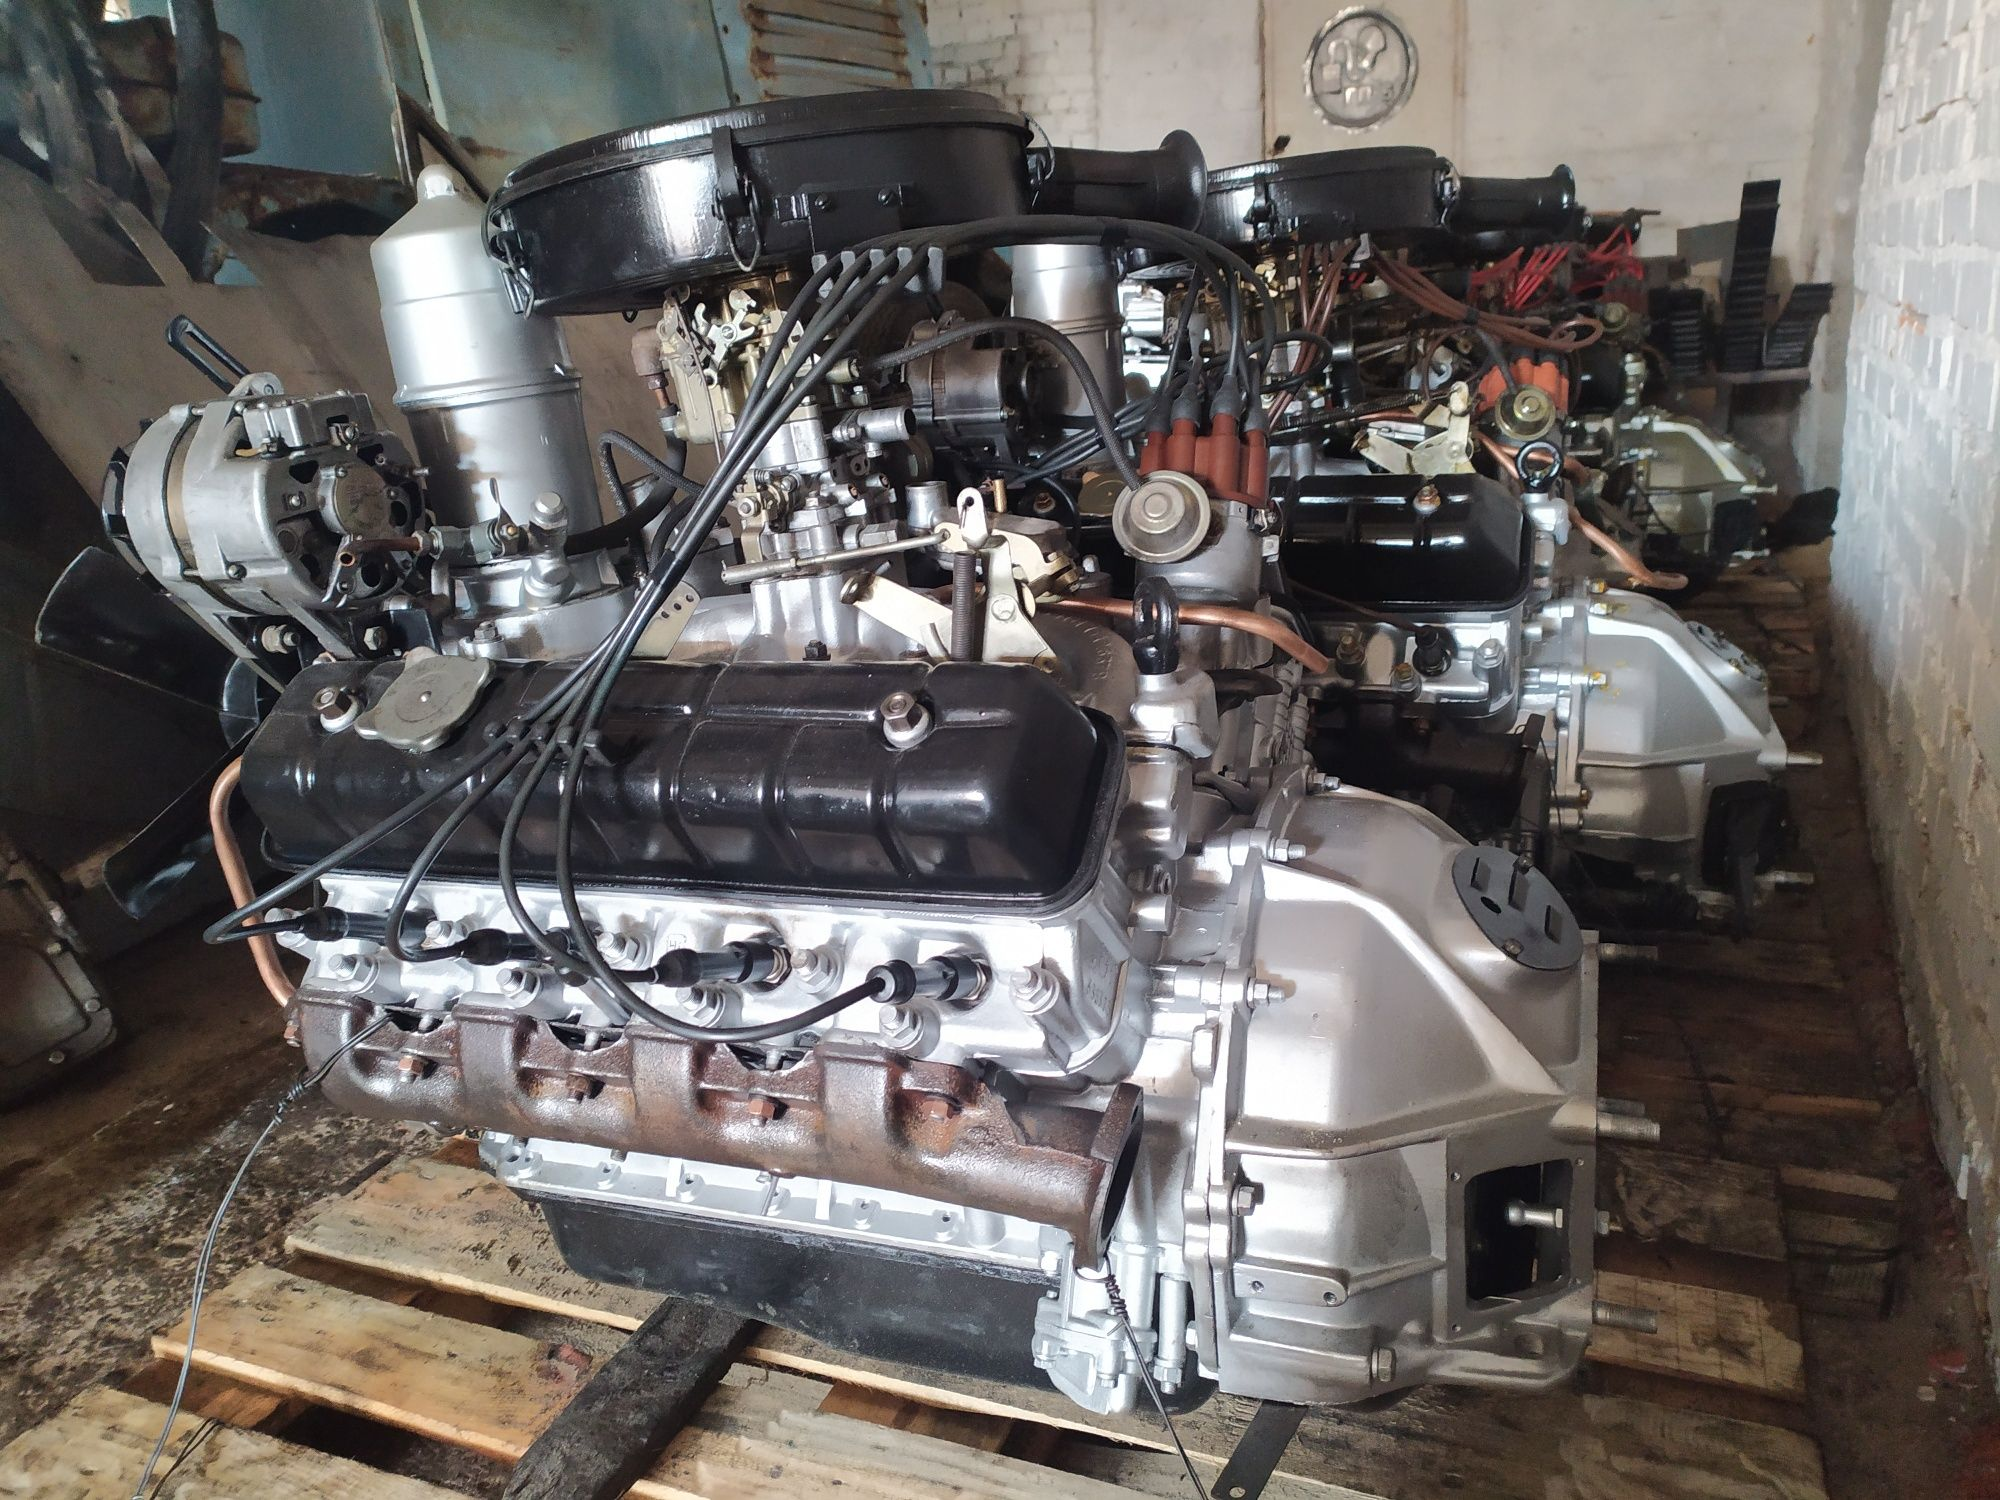 Двигатель мотор ЗМЗ 511 513 523 Газ 53 3307 66 Паз б/у/капремонт